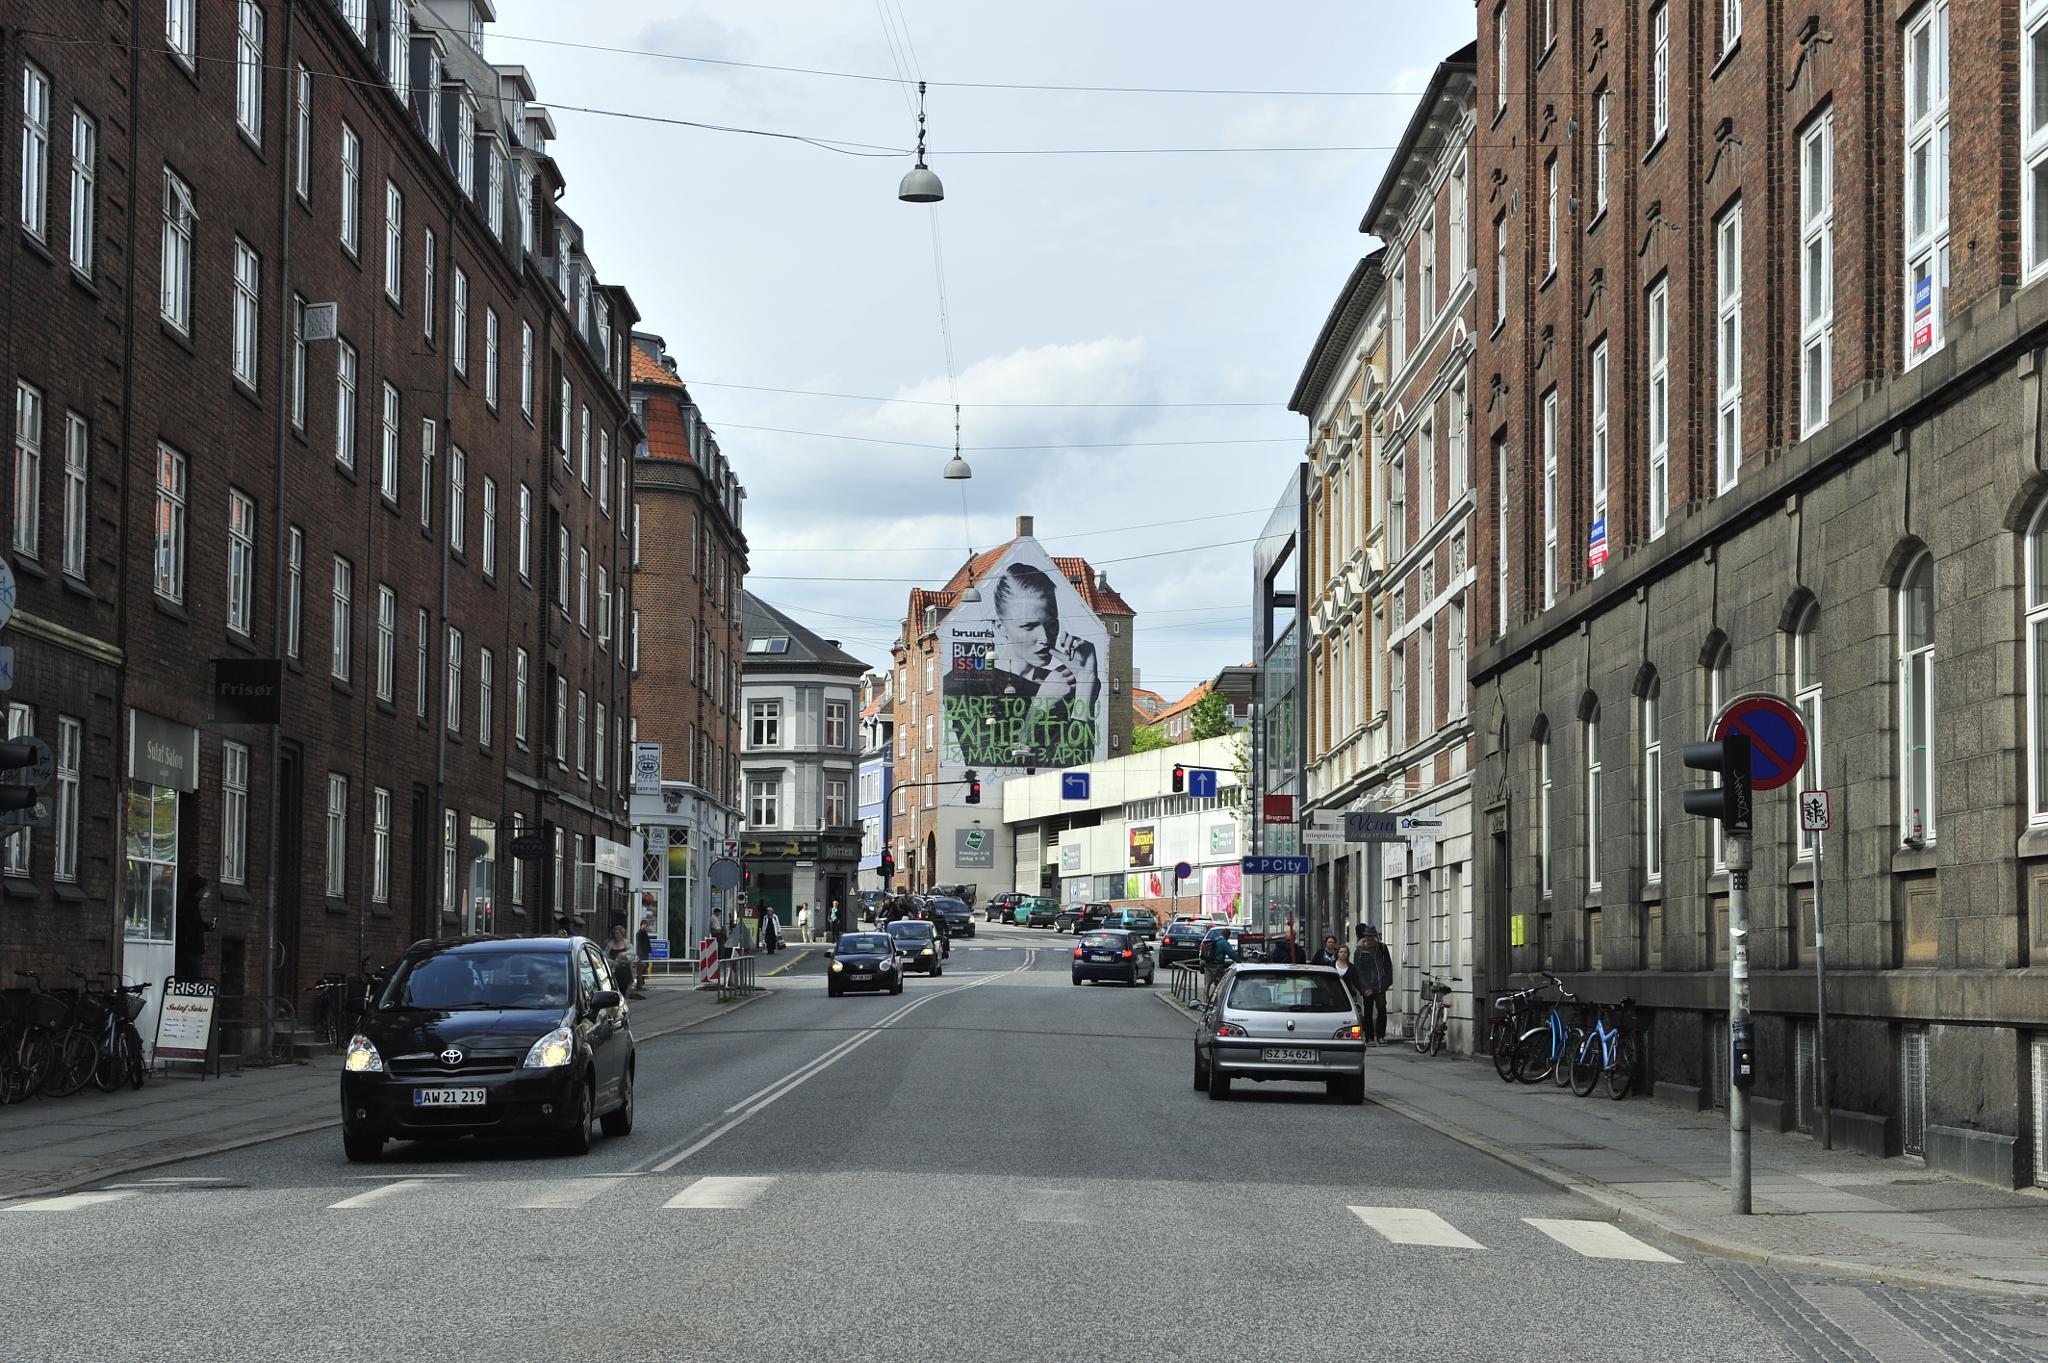 Århus Denmark by Tom Augo Lynge